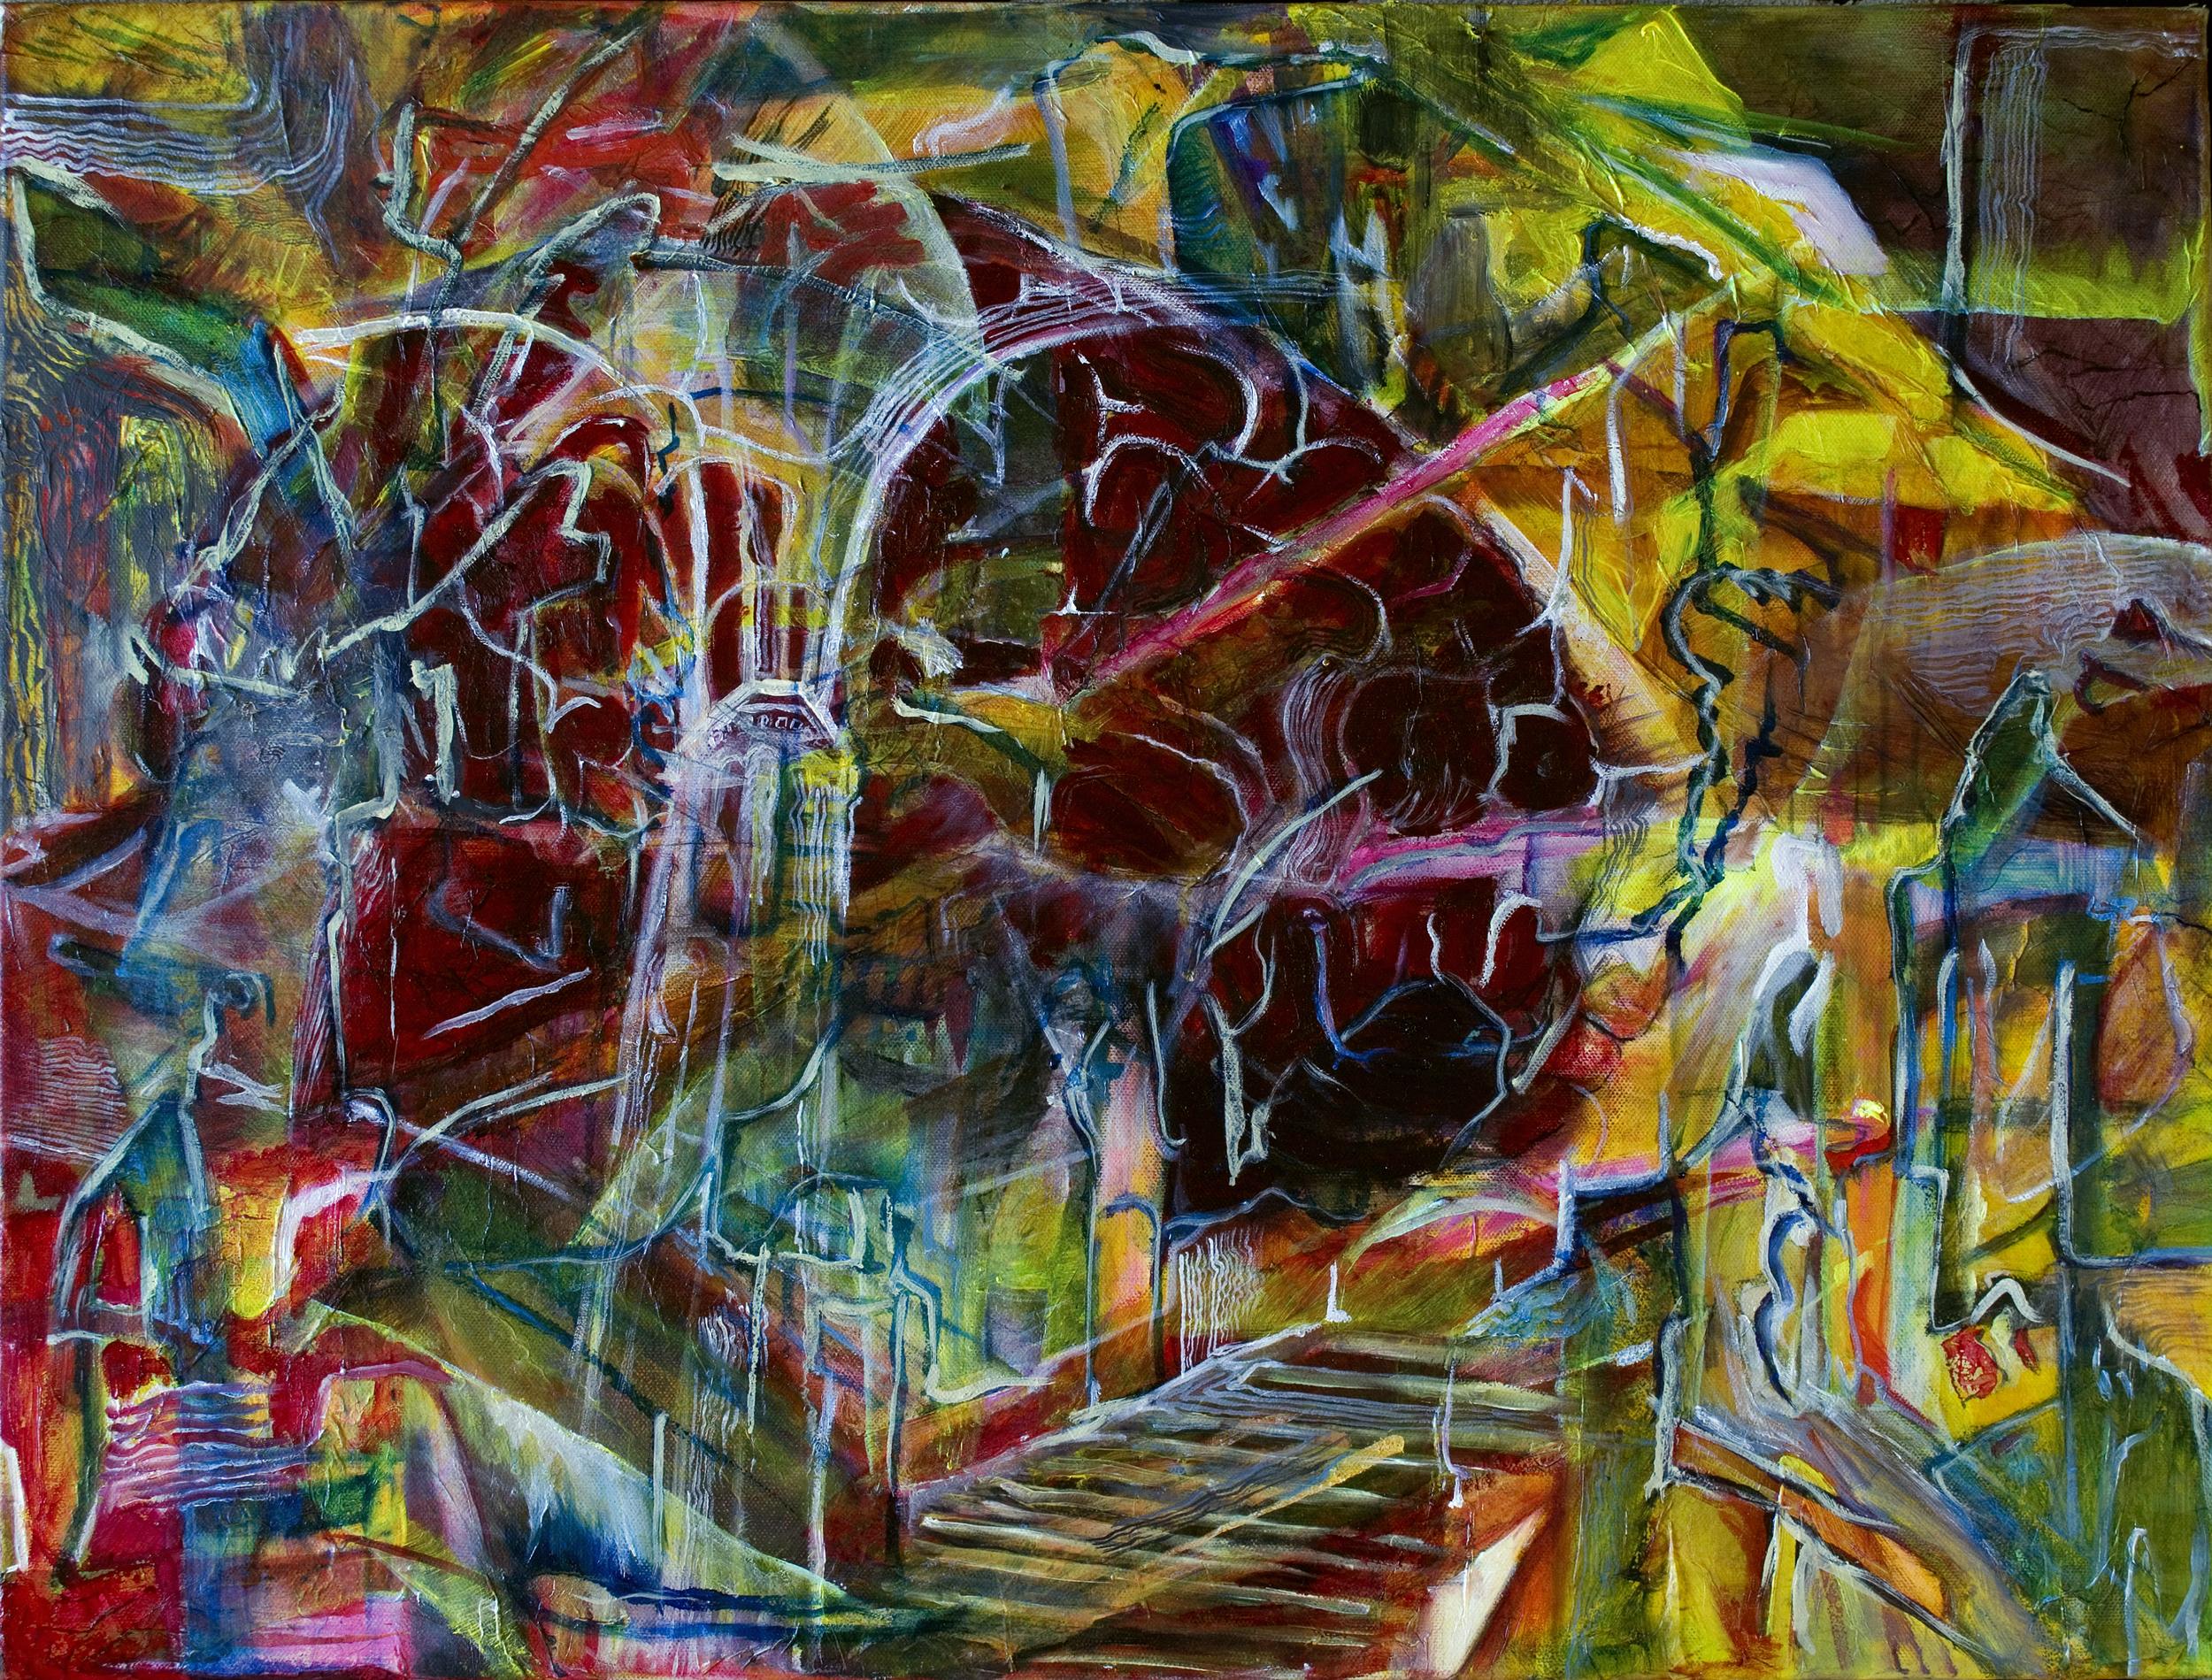 "Piranesi's Labyrinthine Glioma, 31"" x 23"" Oil and mixed media on canvas."